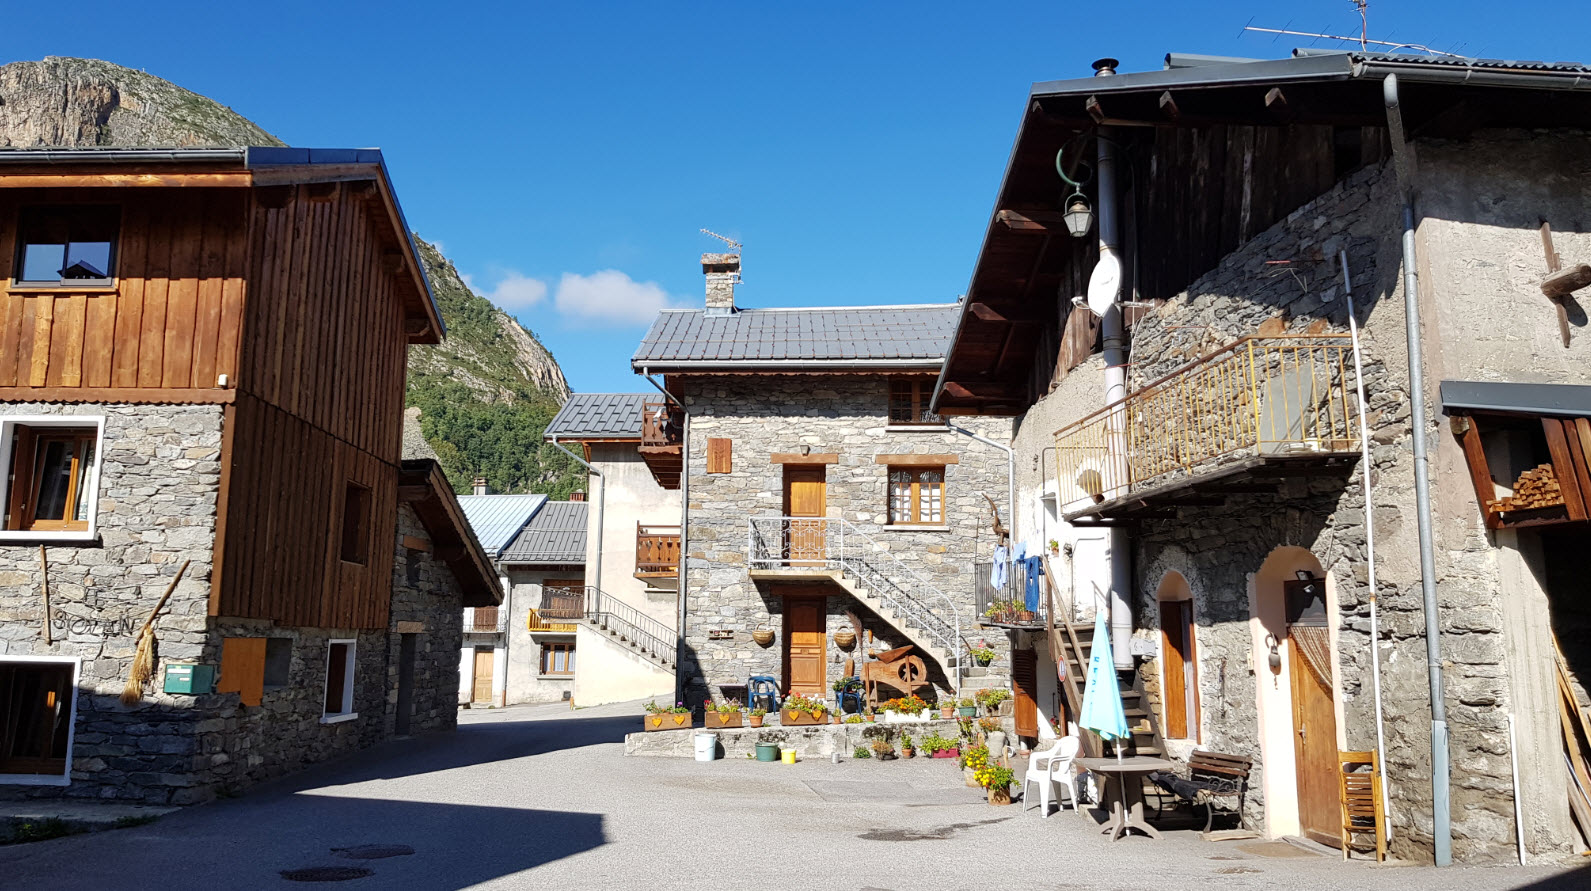 Village de charme Rhone Alpes